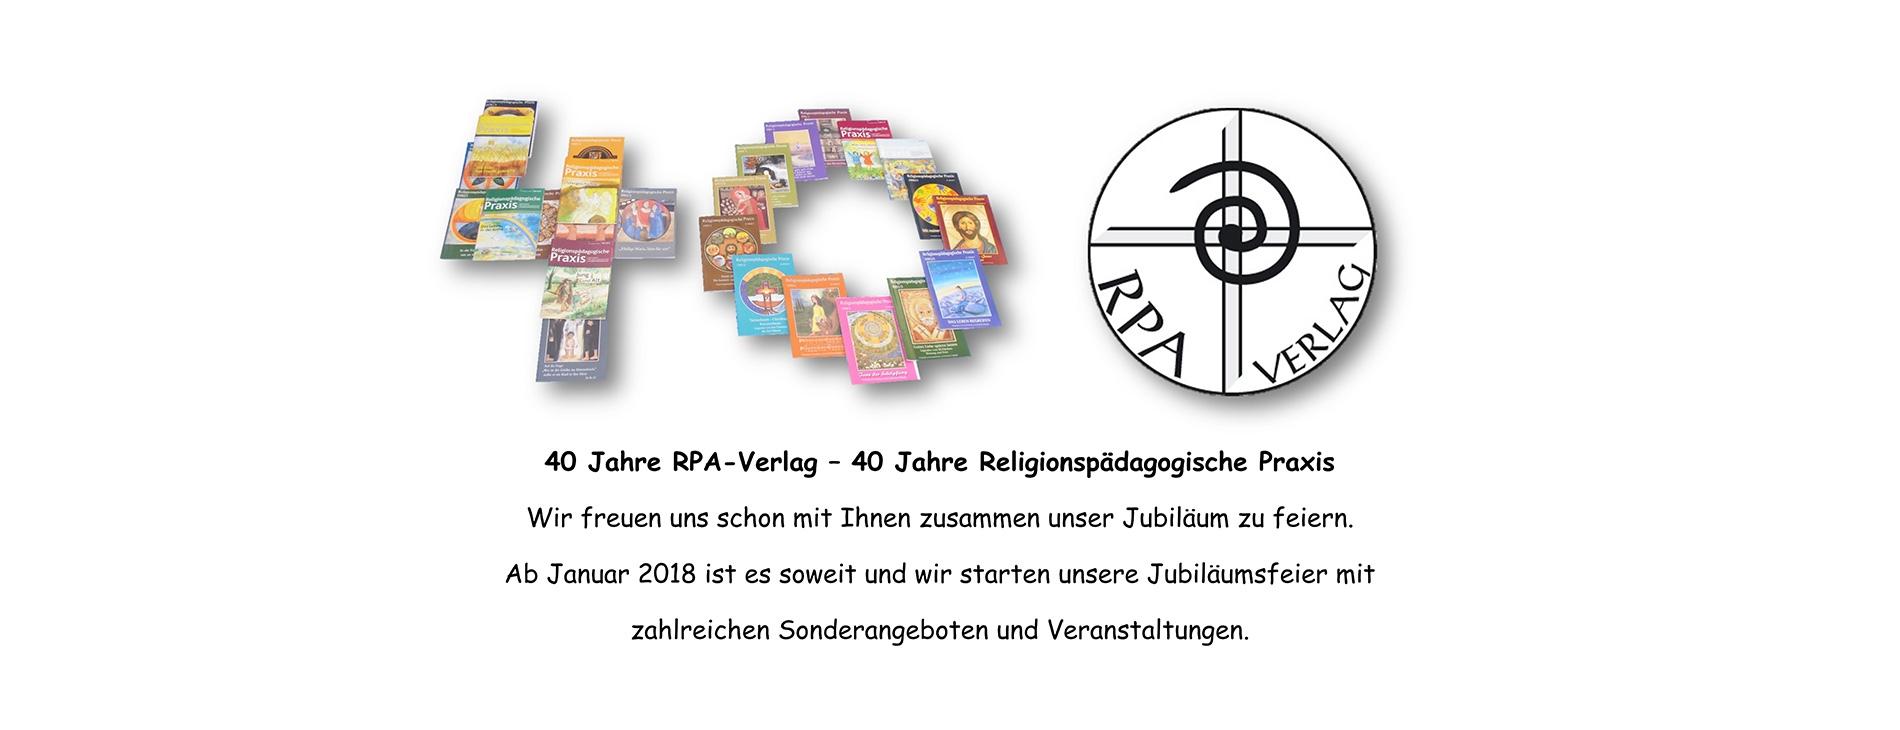 https://rpa-verlag.de/blog/post/40-jahre-rpa-verlag/